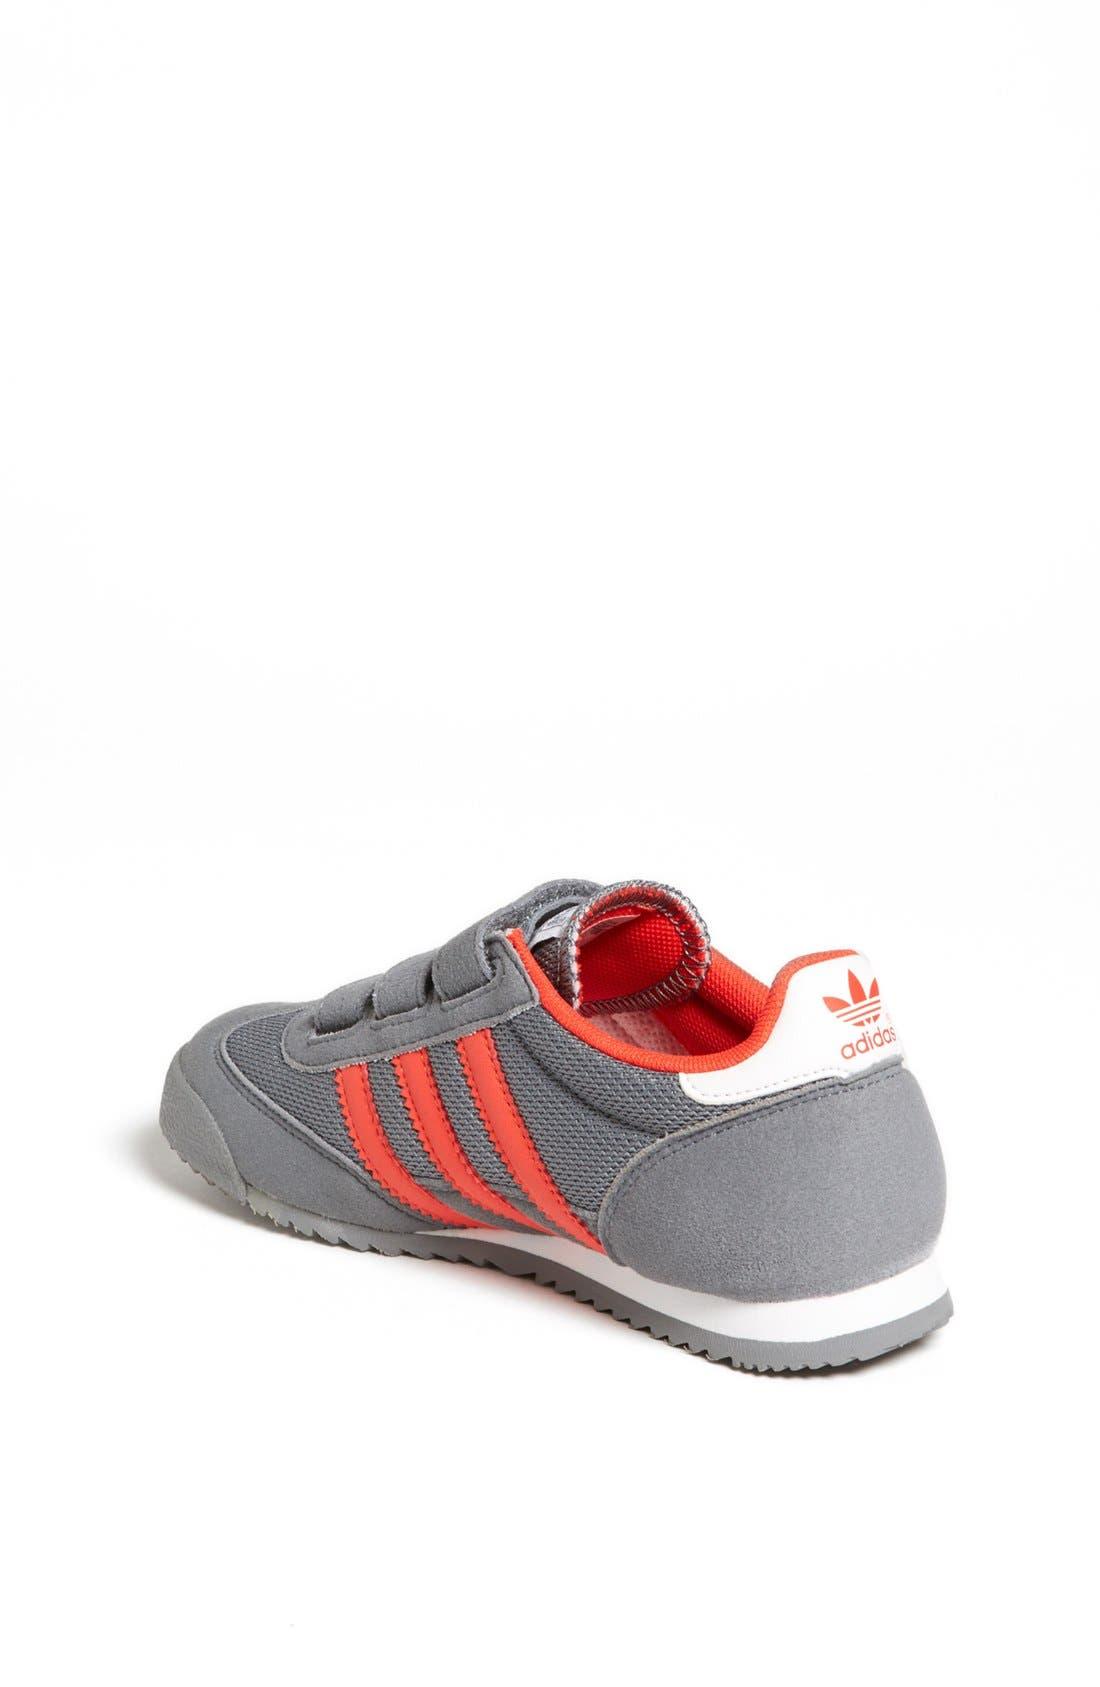 Alternate Image 2  - adidas 'Dragon' Sneaker (Toddler & Little Kid)